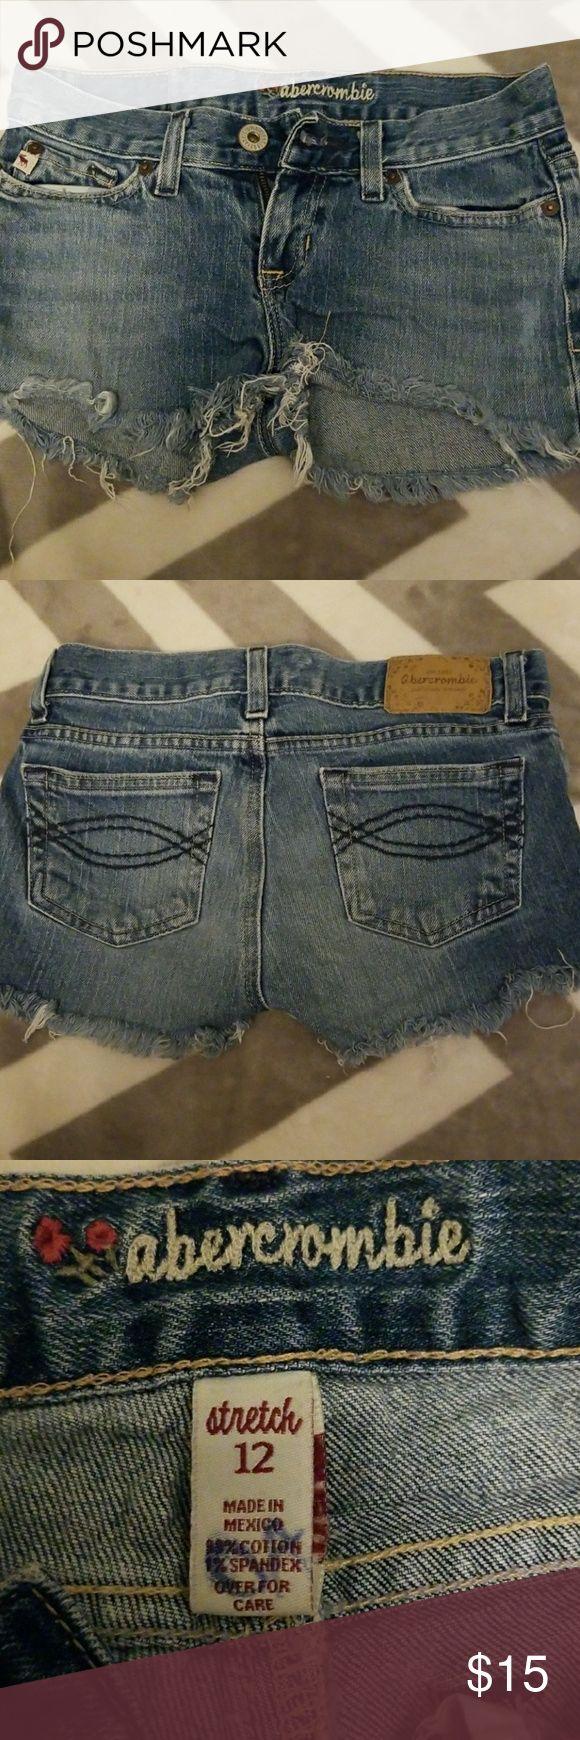 Abercrombie Jean shorts Size 12, stretch, Abercrombie Jean frayed shorts Abercrombie & Fitch Bottoms Jeans